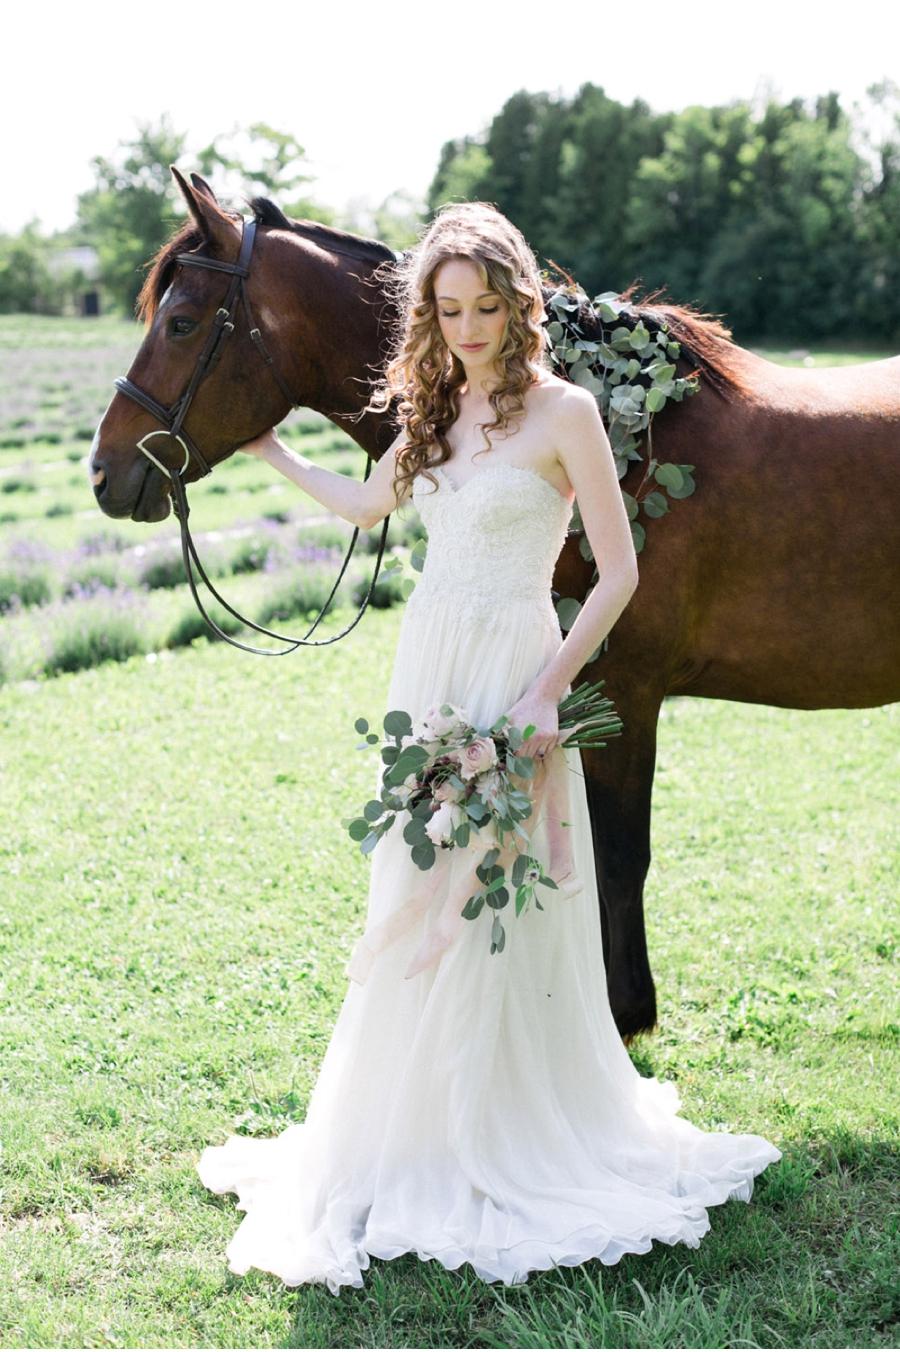 Canadian-Wedding-Photographer-Lavender-Farm